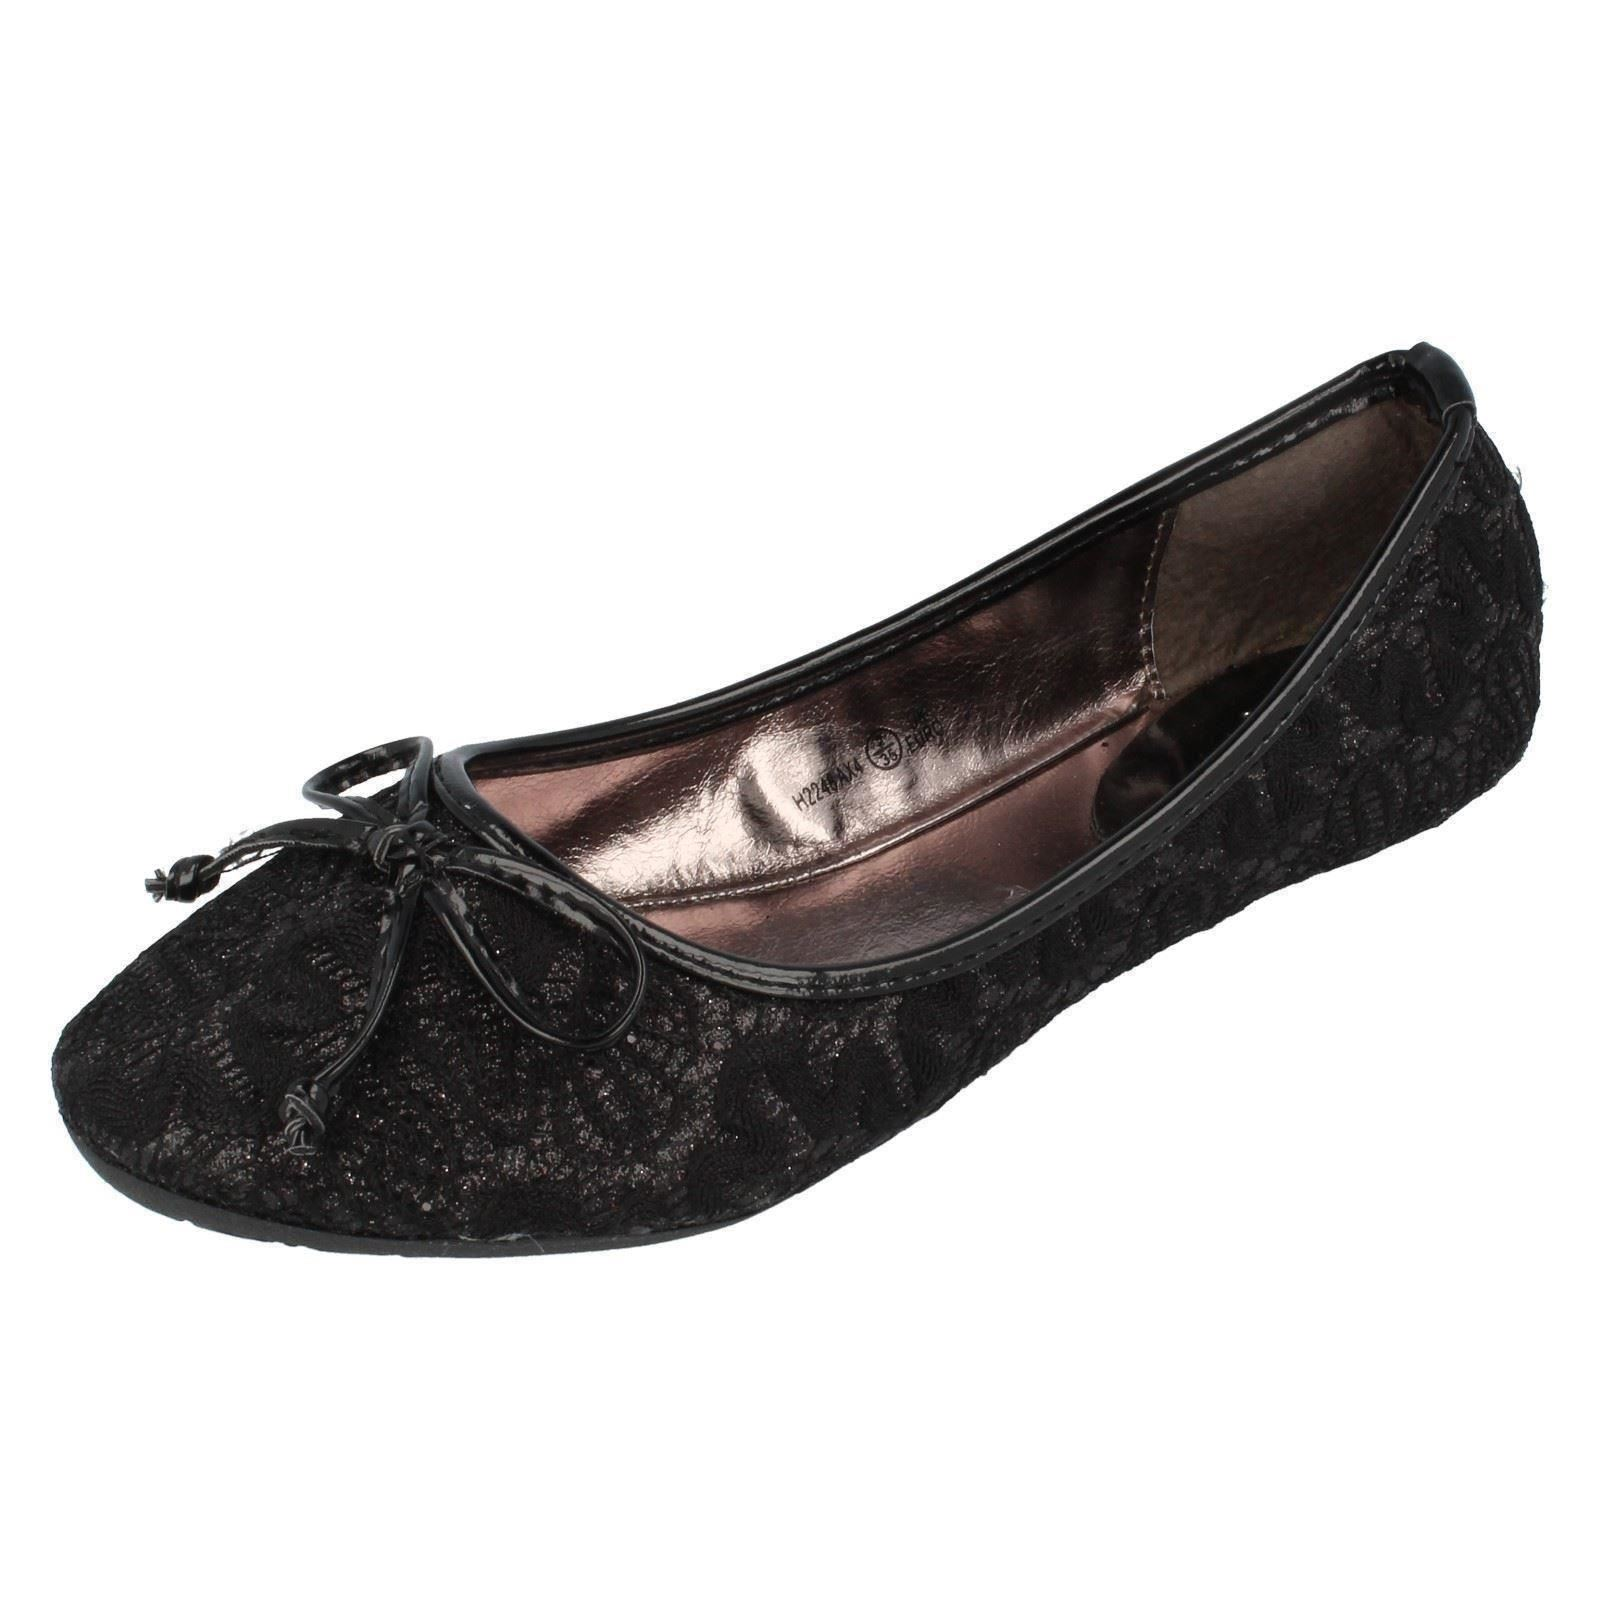 Zapatos Planos Chicas Cutie Etiqueta H2248 ~ N